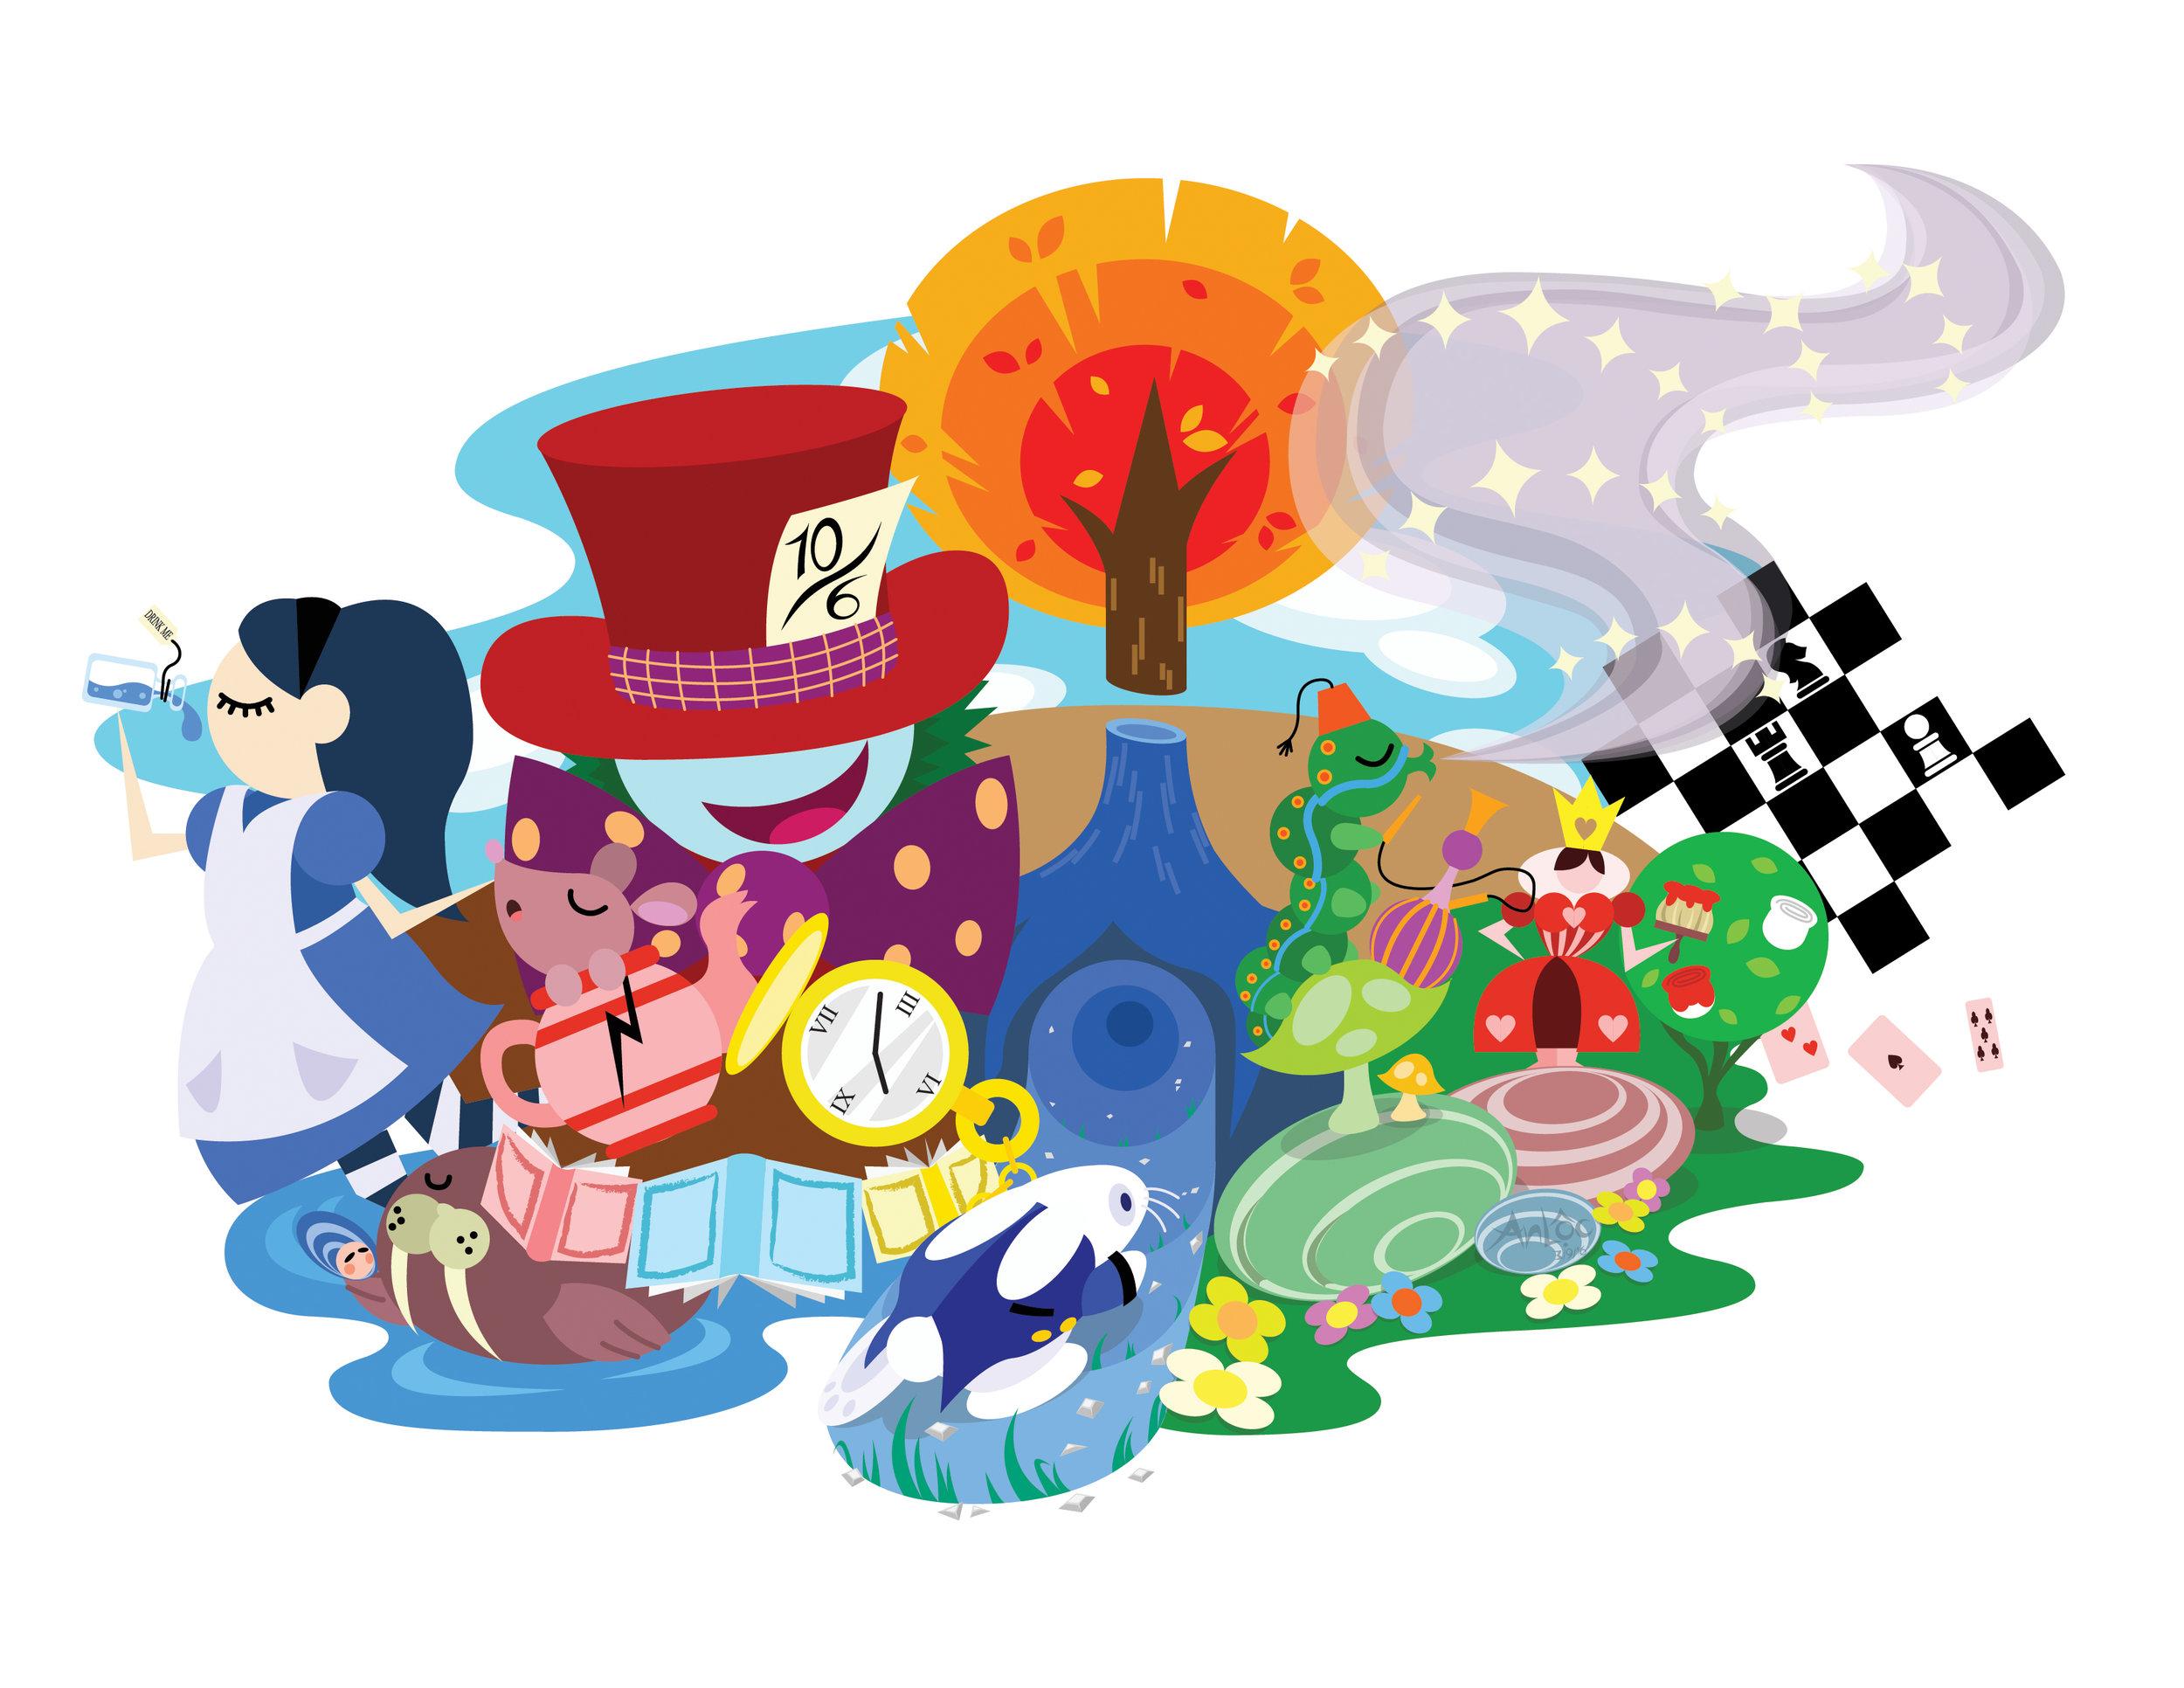 """Alice in Wonderland"" Google Doodle by An Pham"